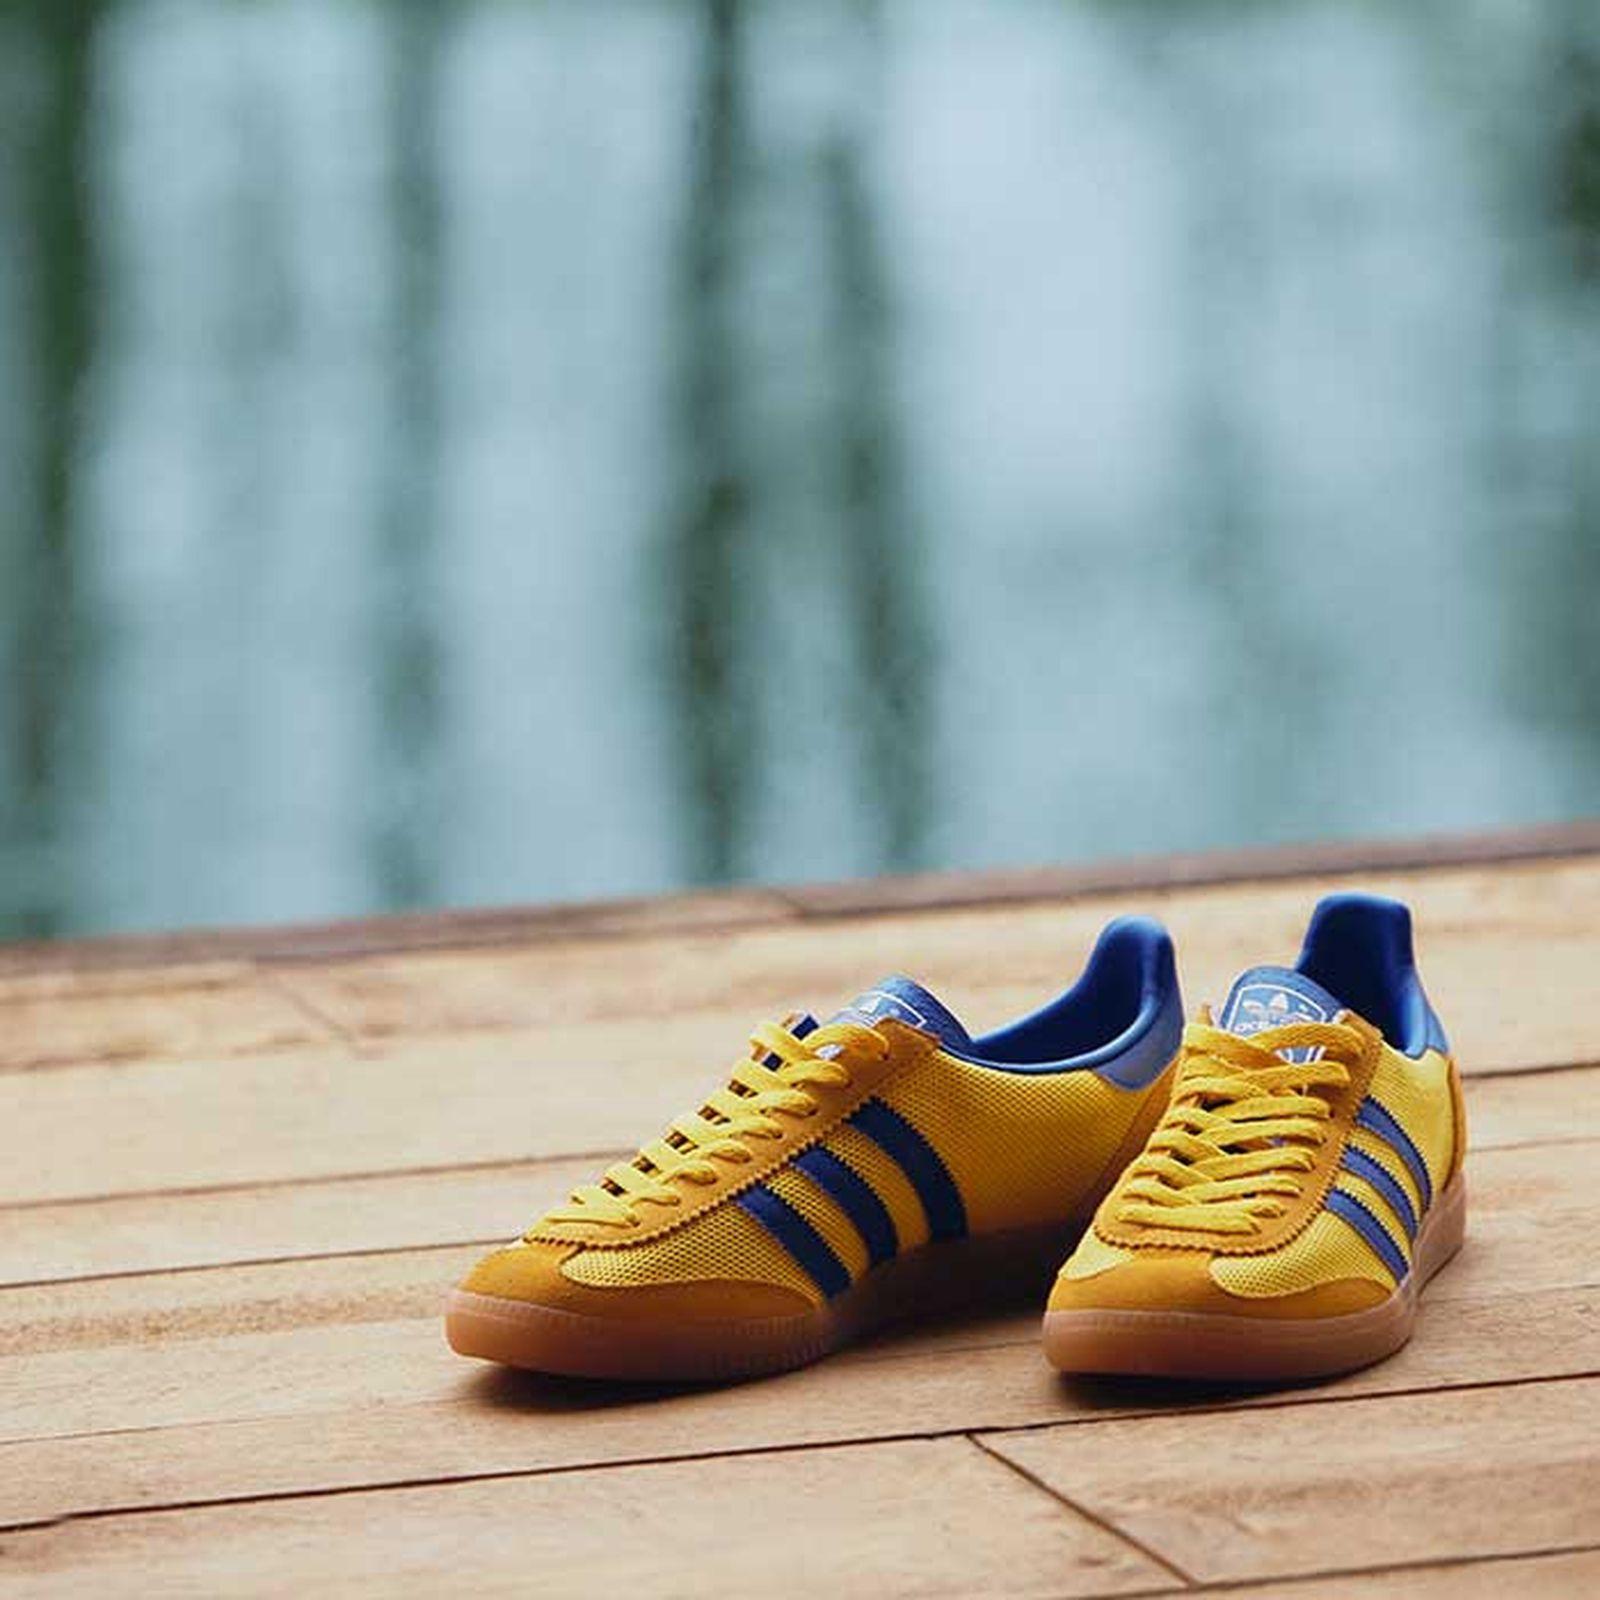 adidas-spezial-ss21-release-info-05